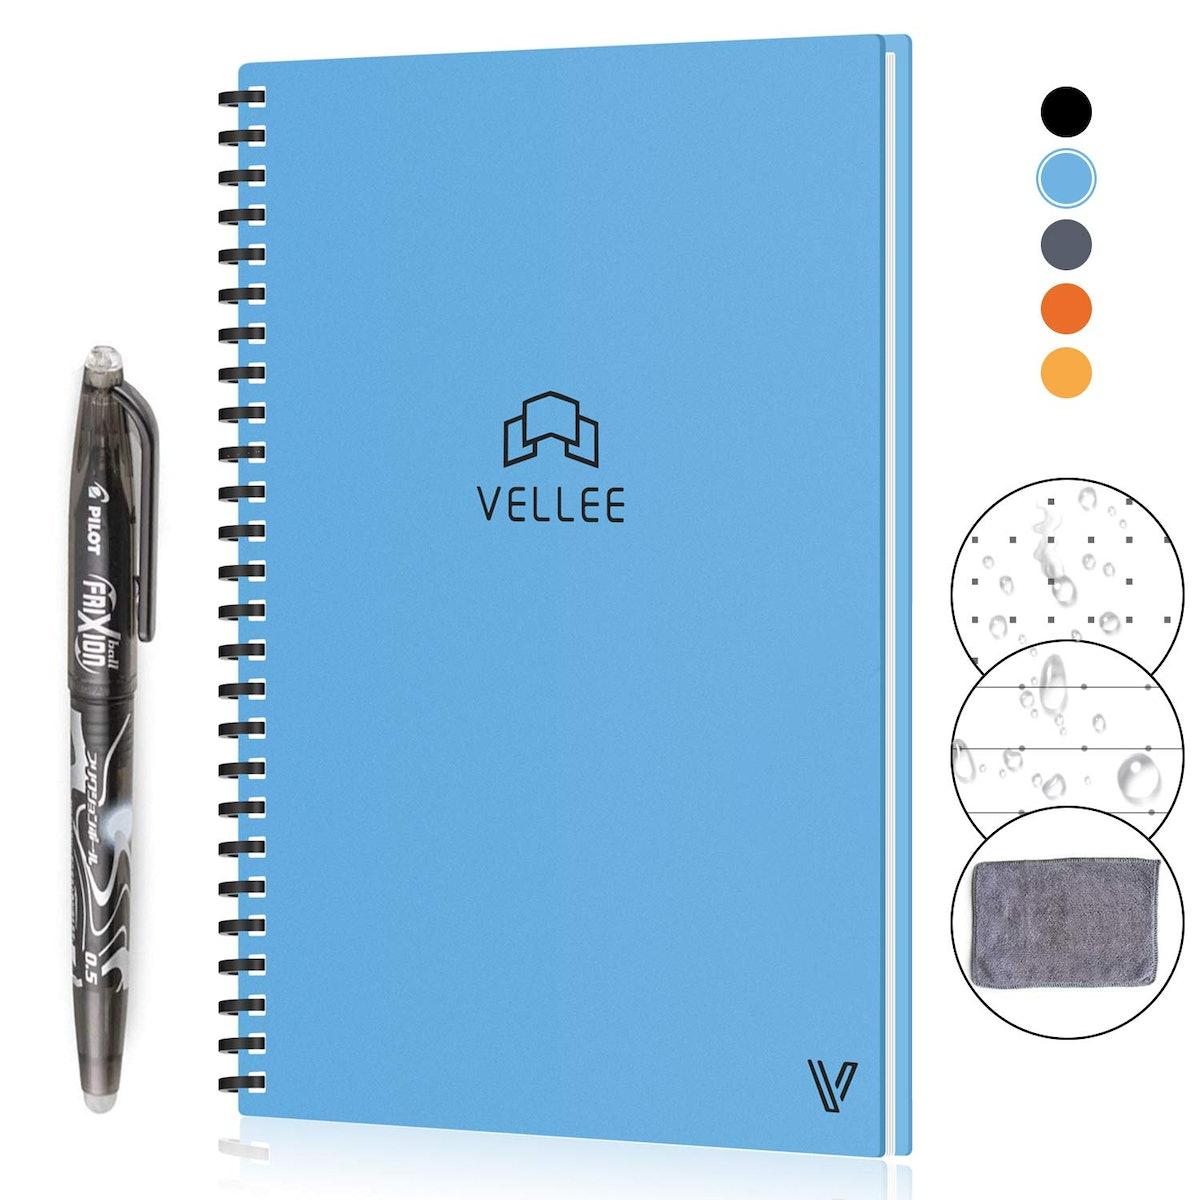 KYSTORE B5 Reusable Smart Erasable Notebook